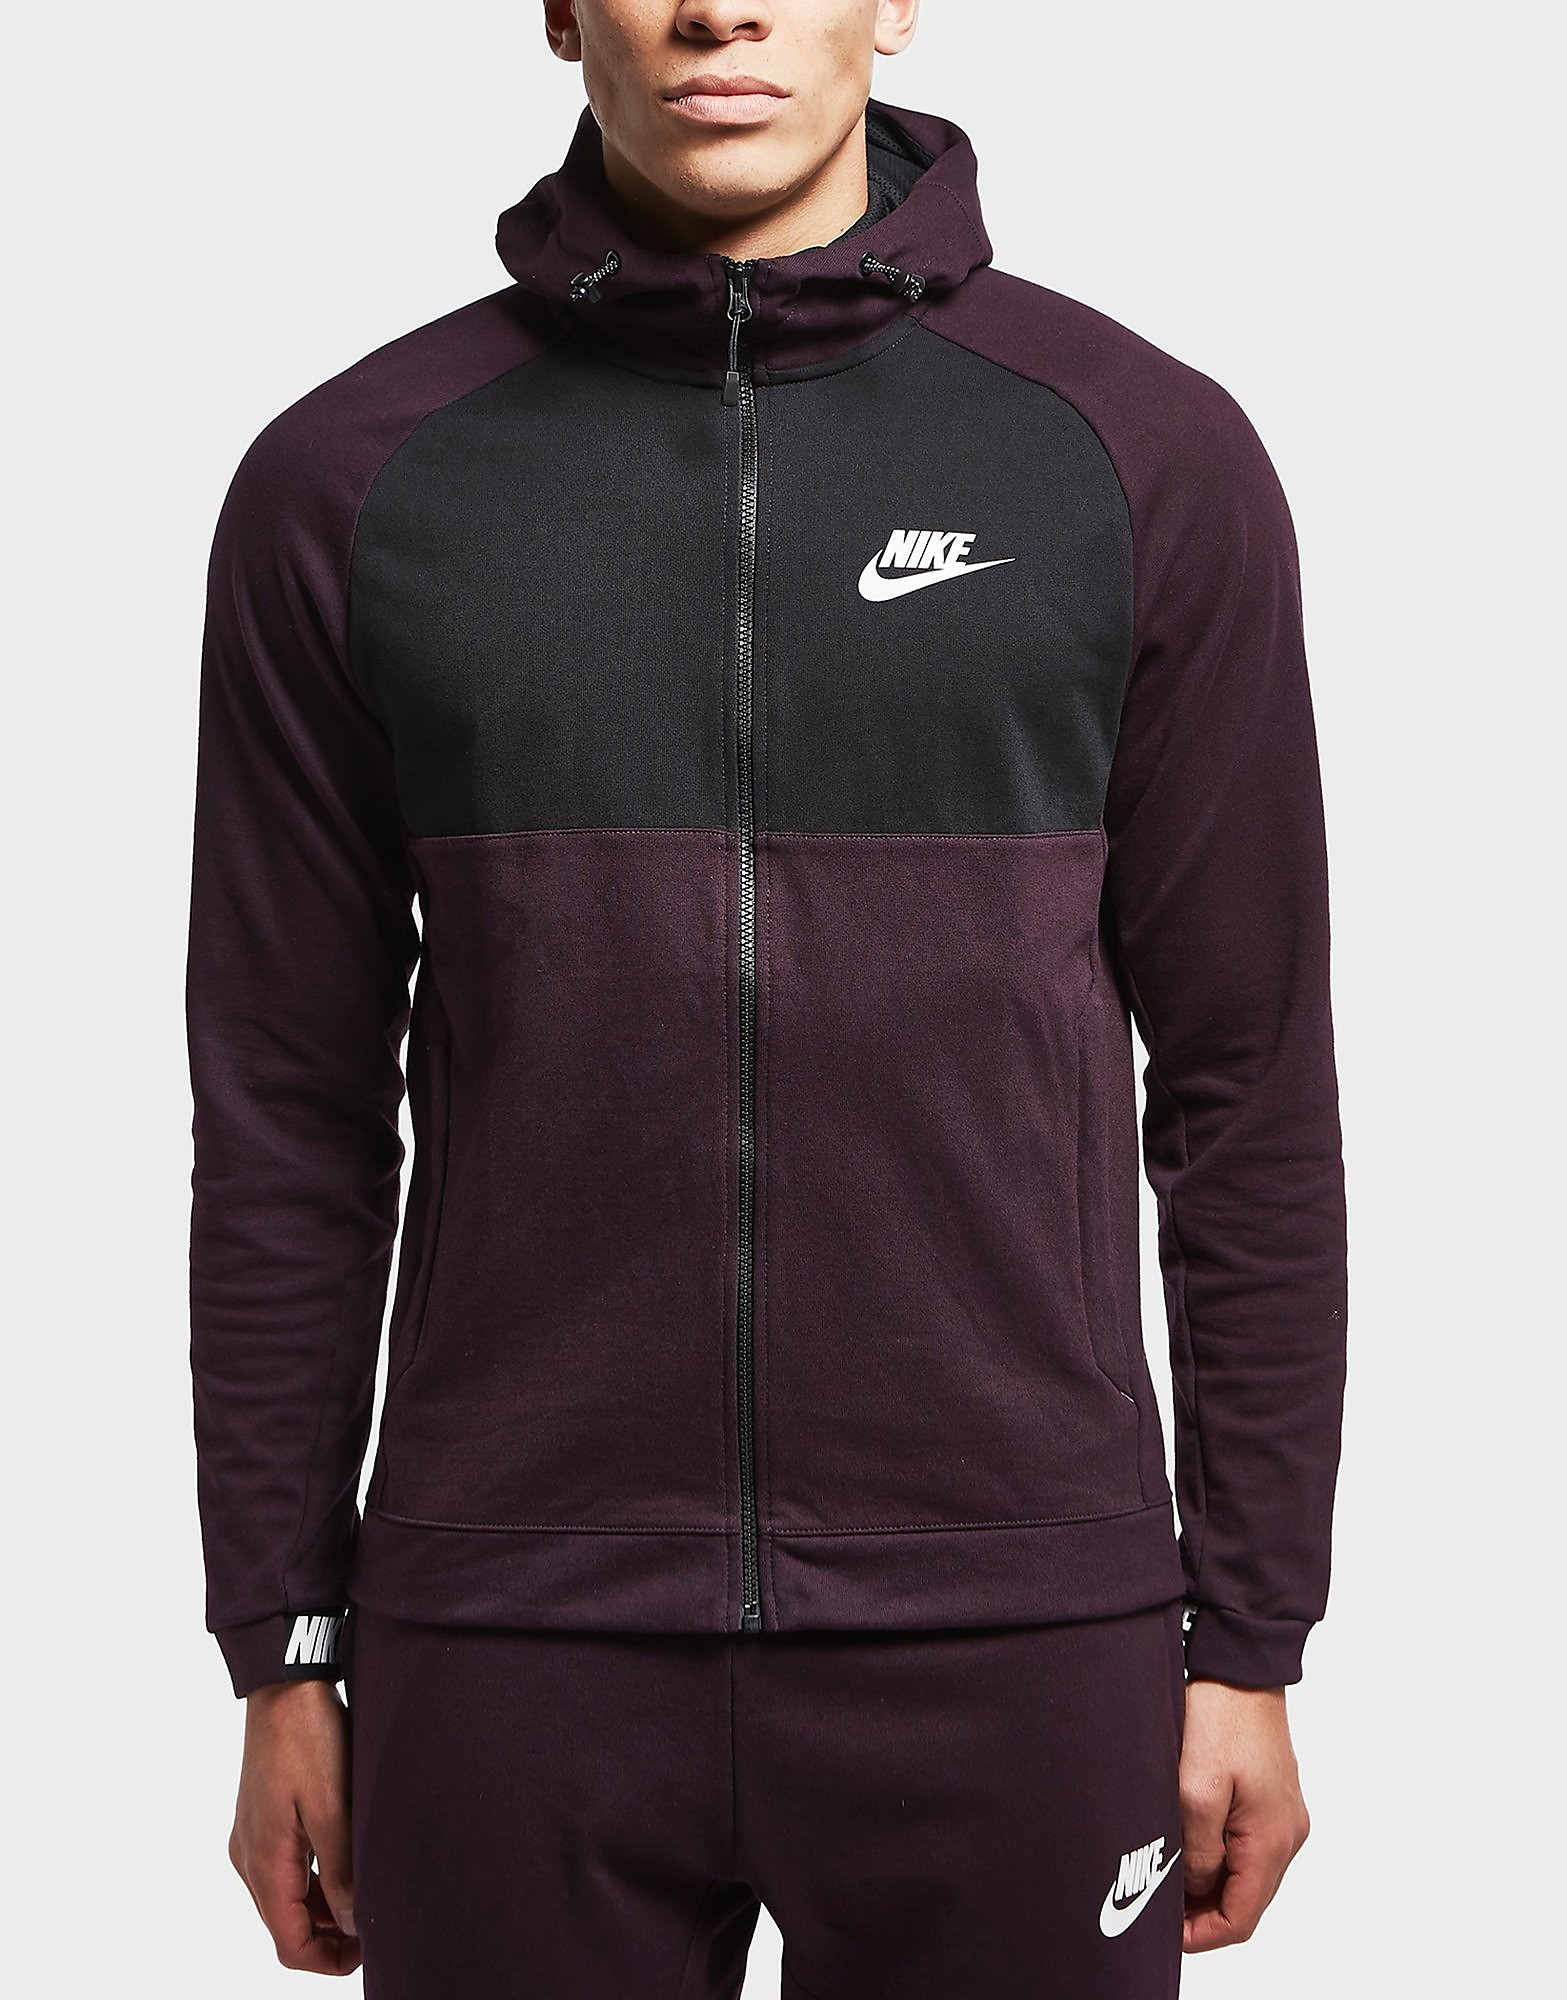 Nike ADV 365 Full Zip Hoody